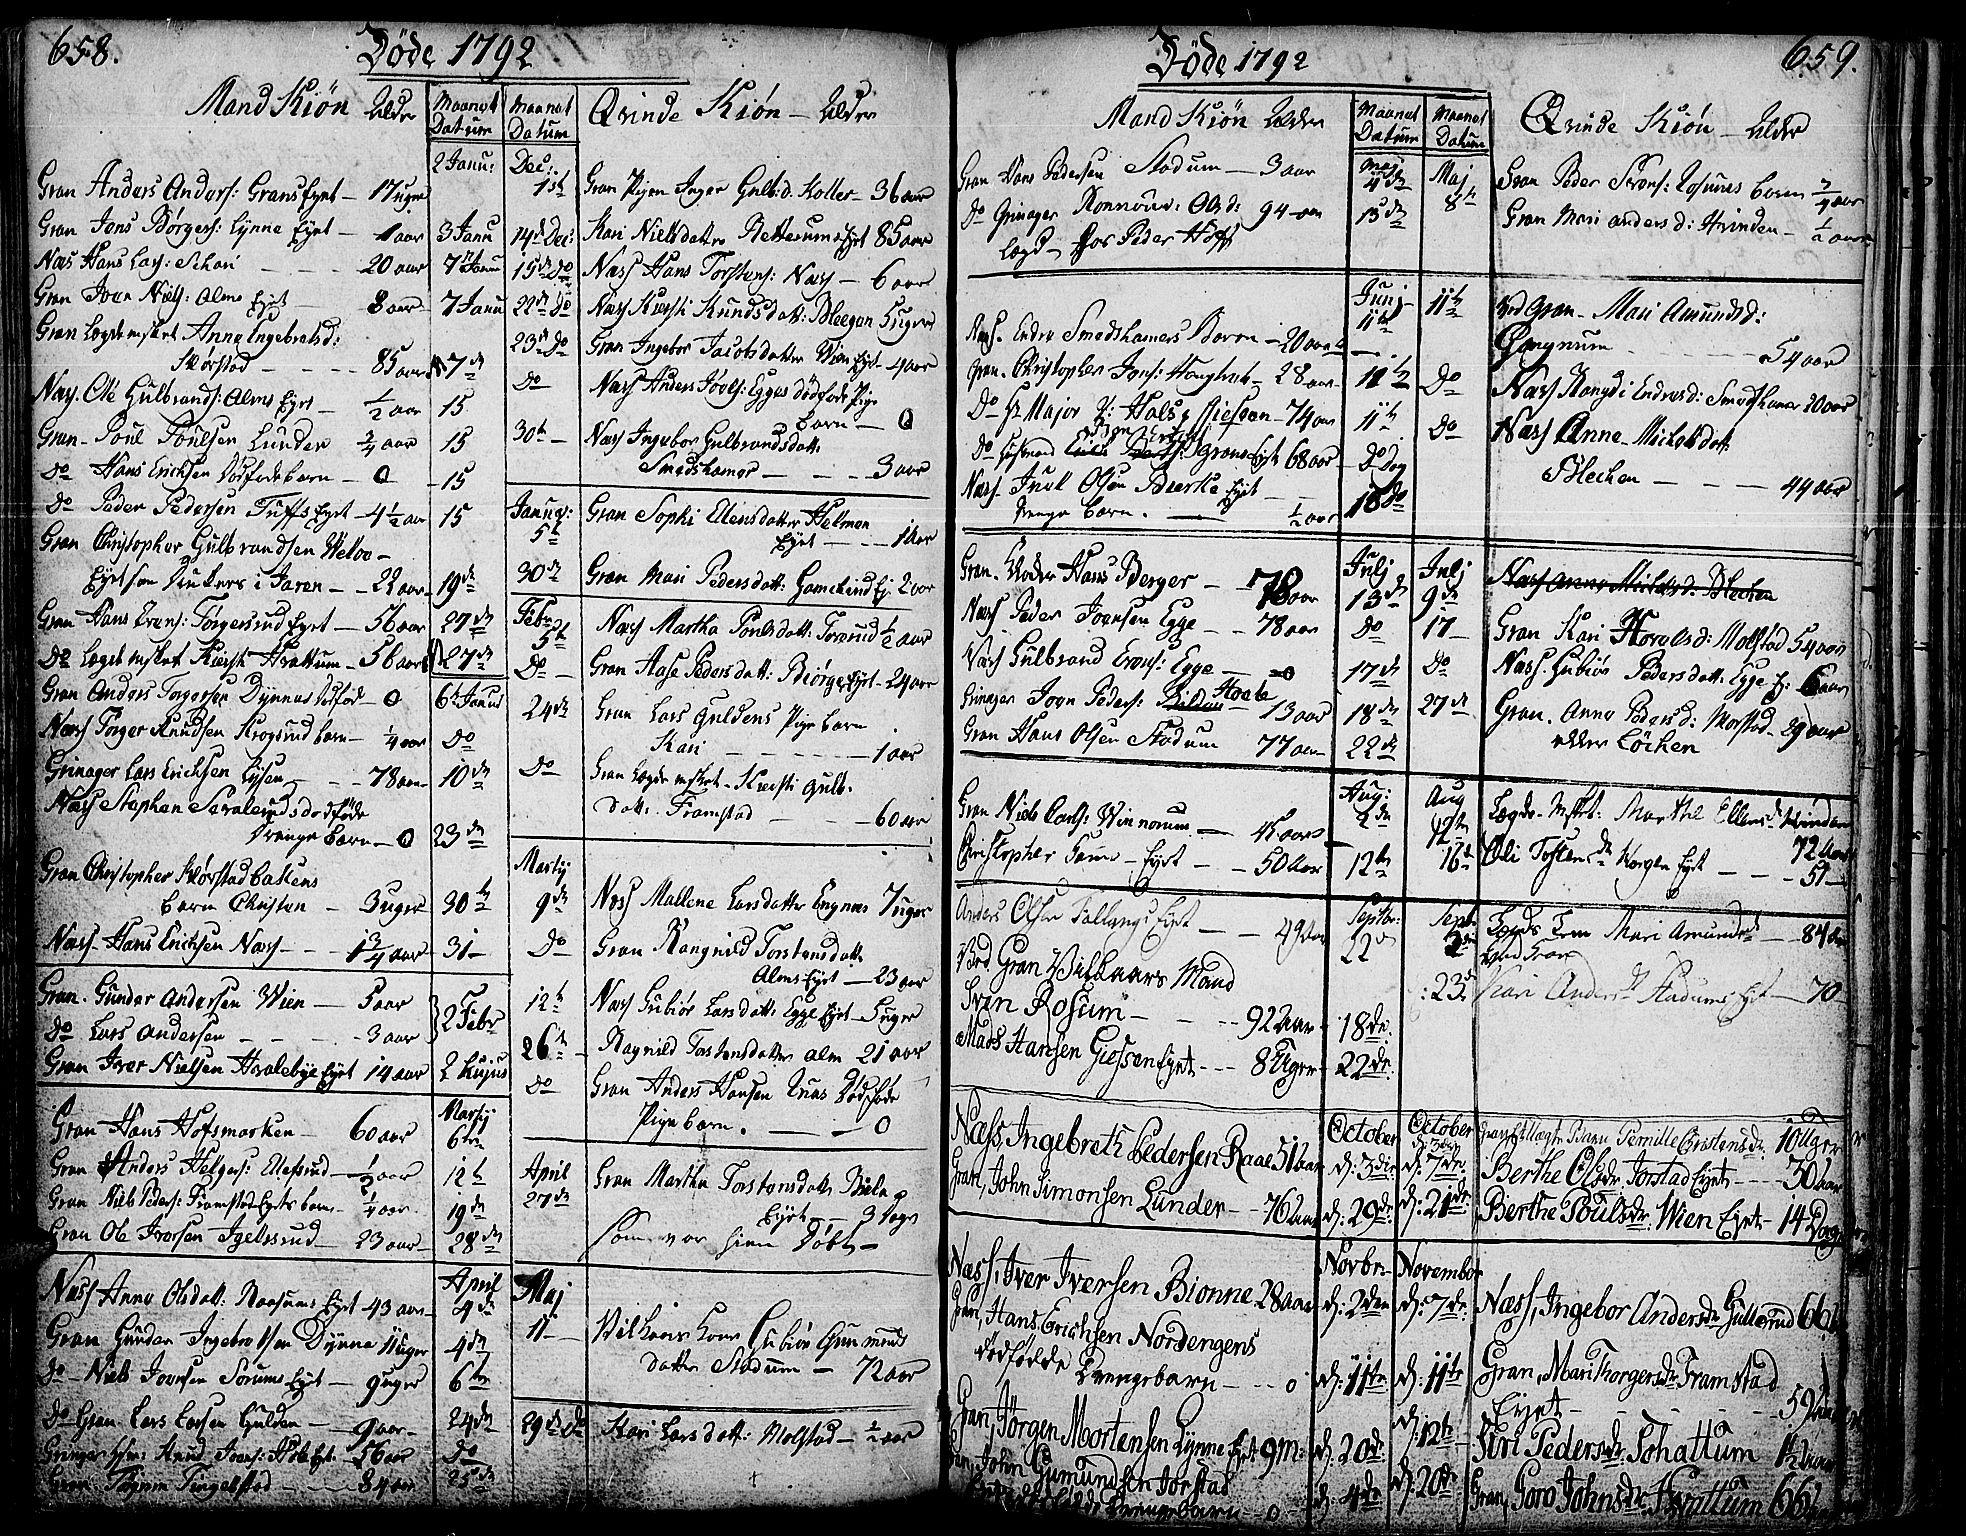 SAH, Gran prestekontor, Ministerialbok nr. 6, 1787-1824, s. 658-659